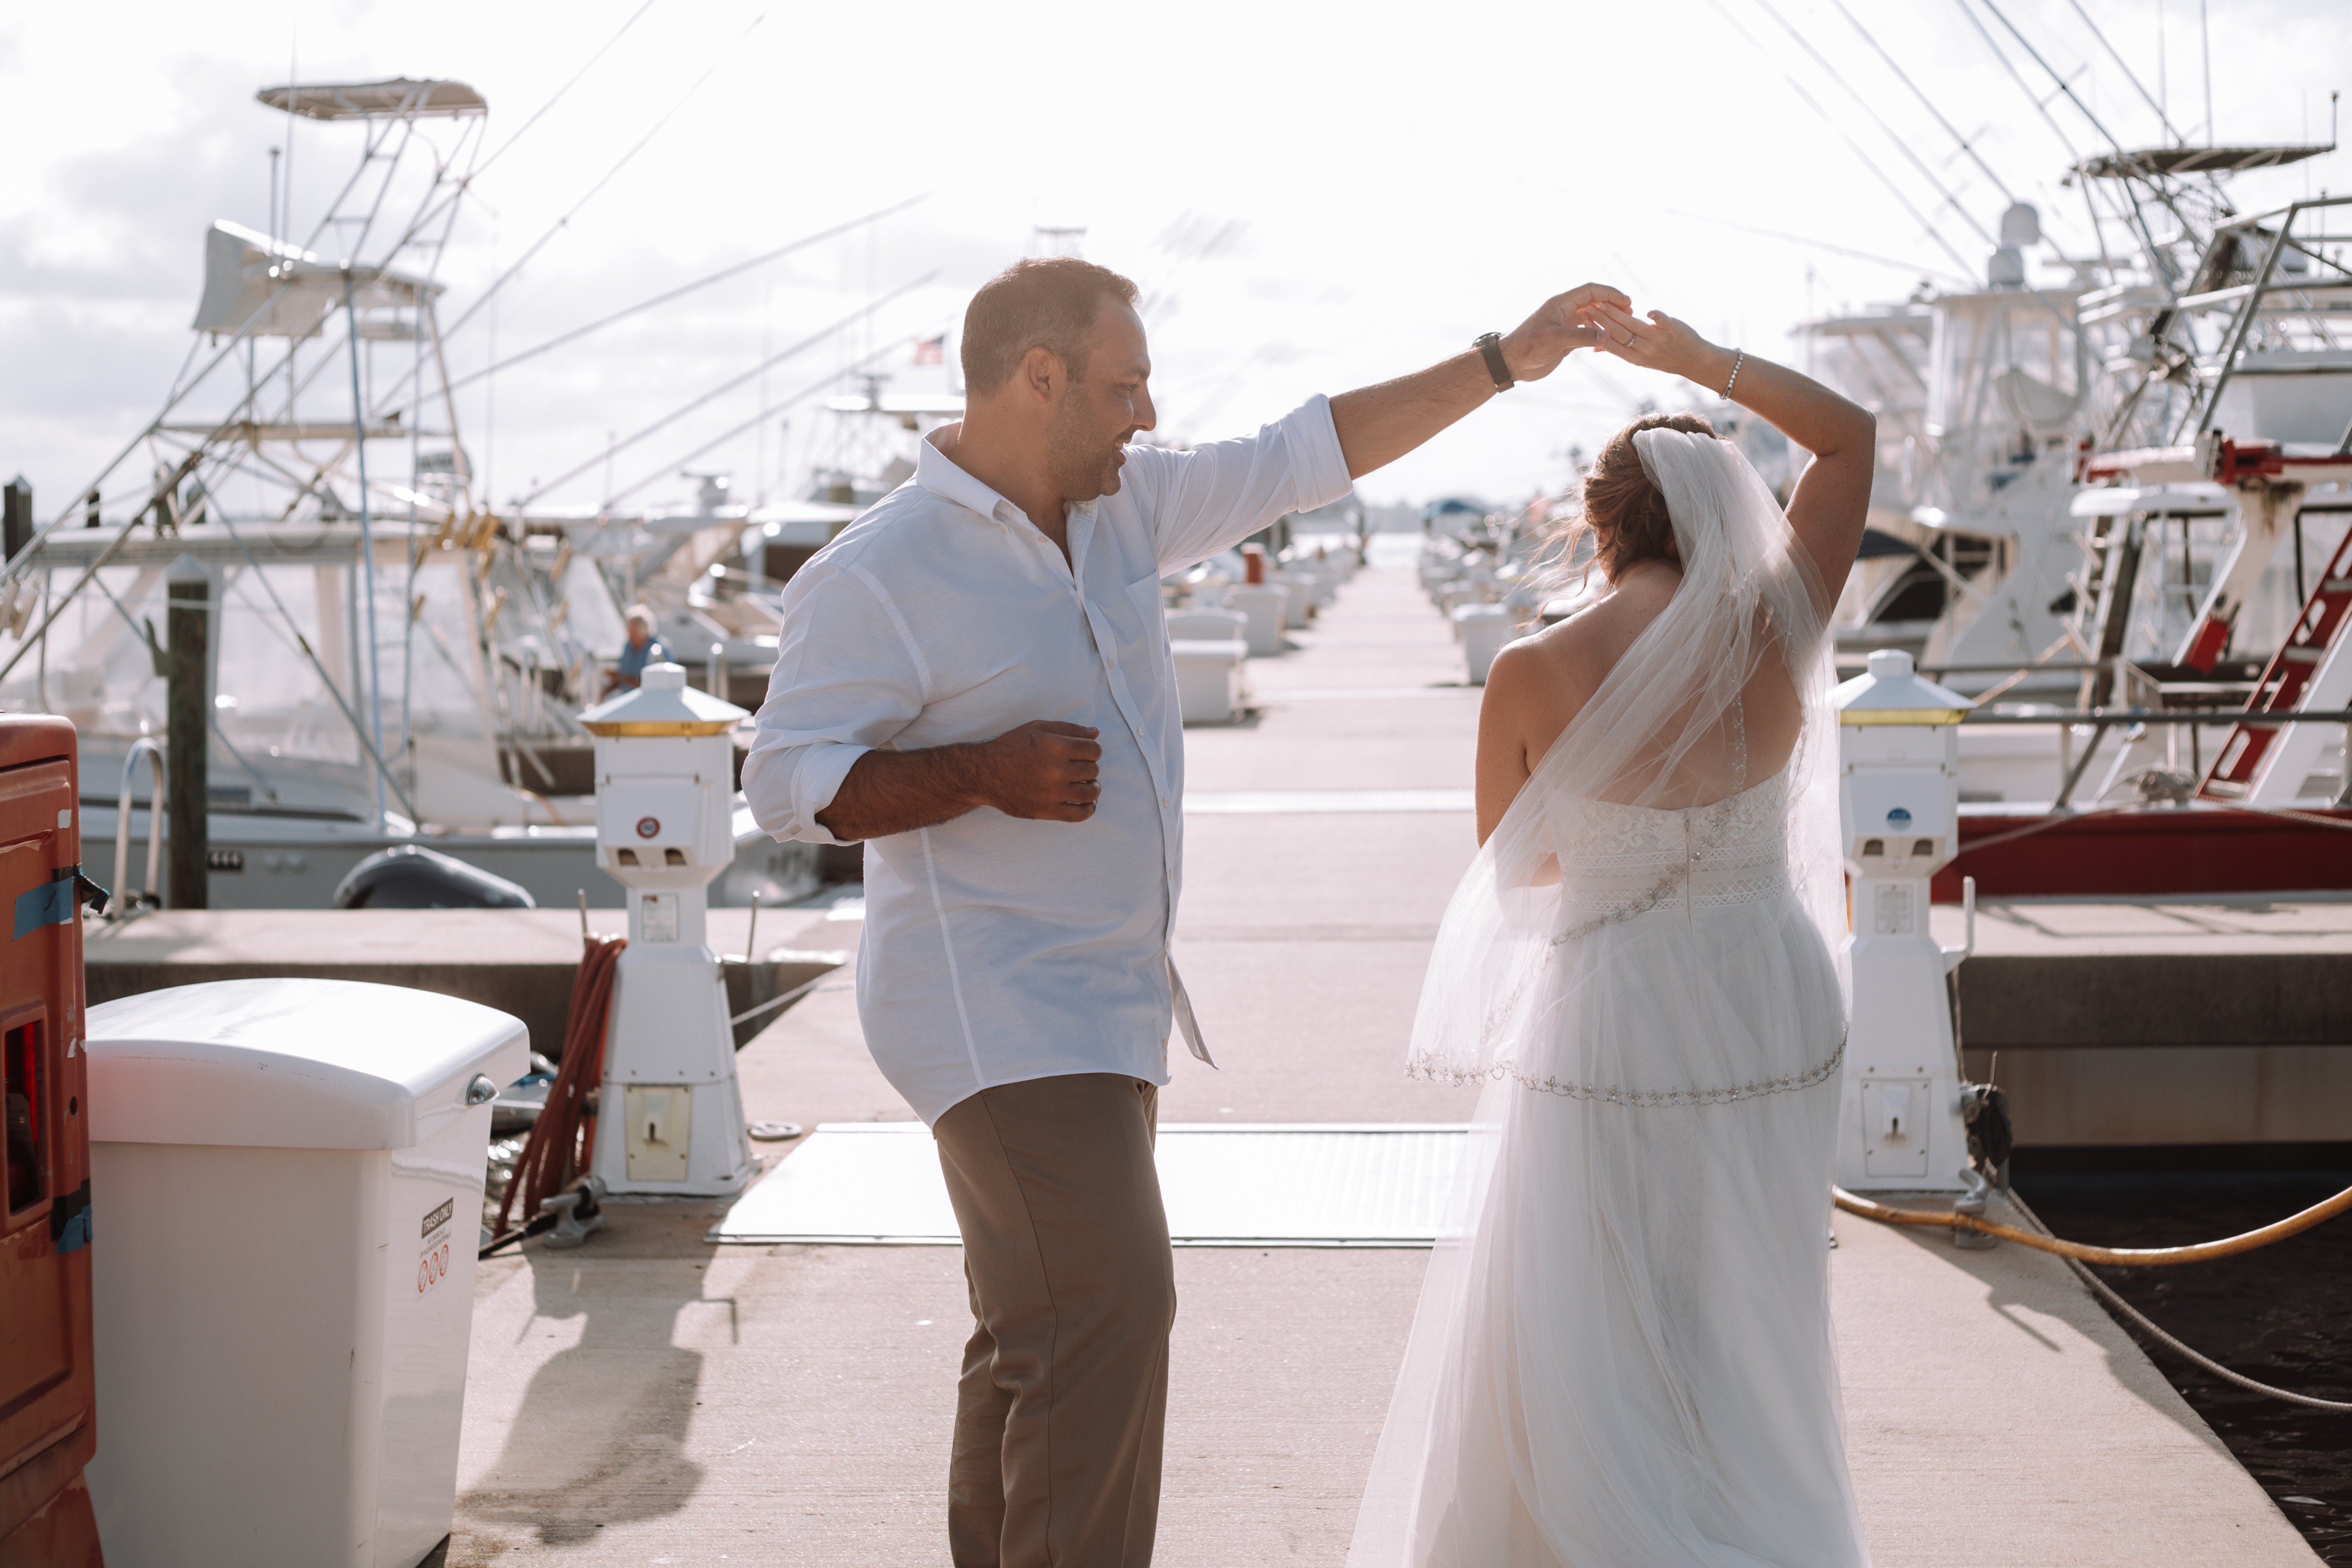 palm-beach-wedding-rkm-photography-112